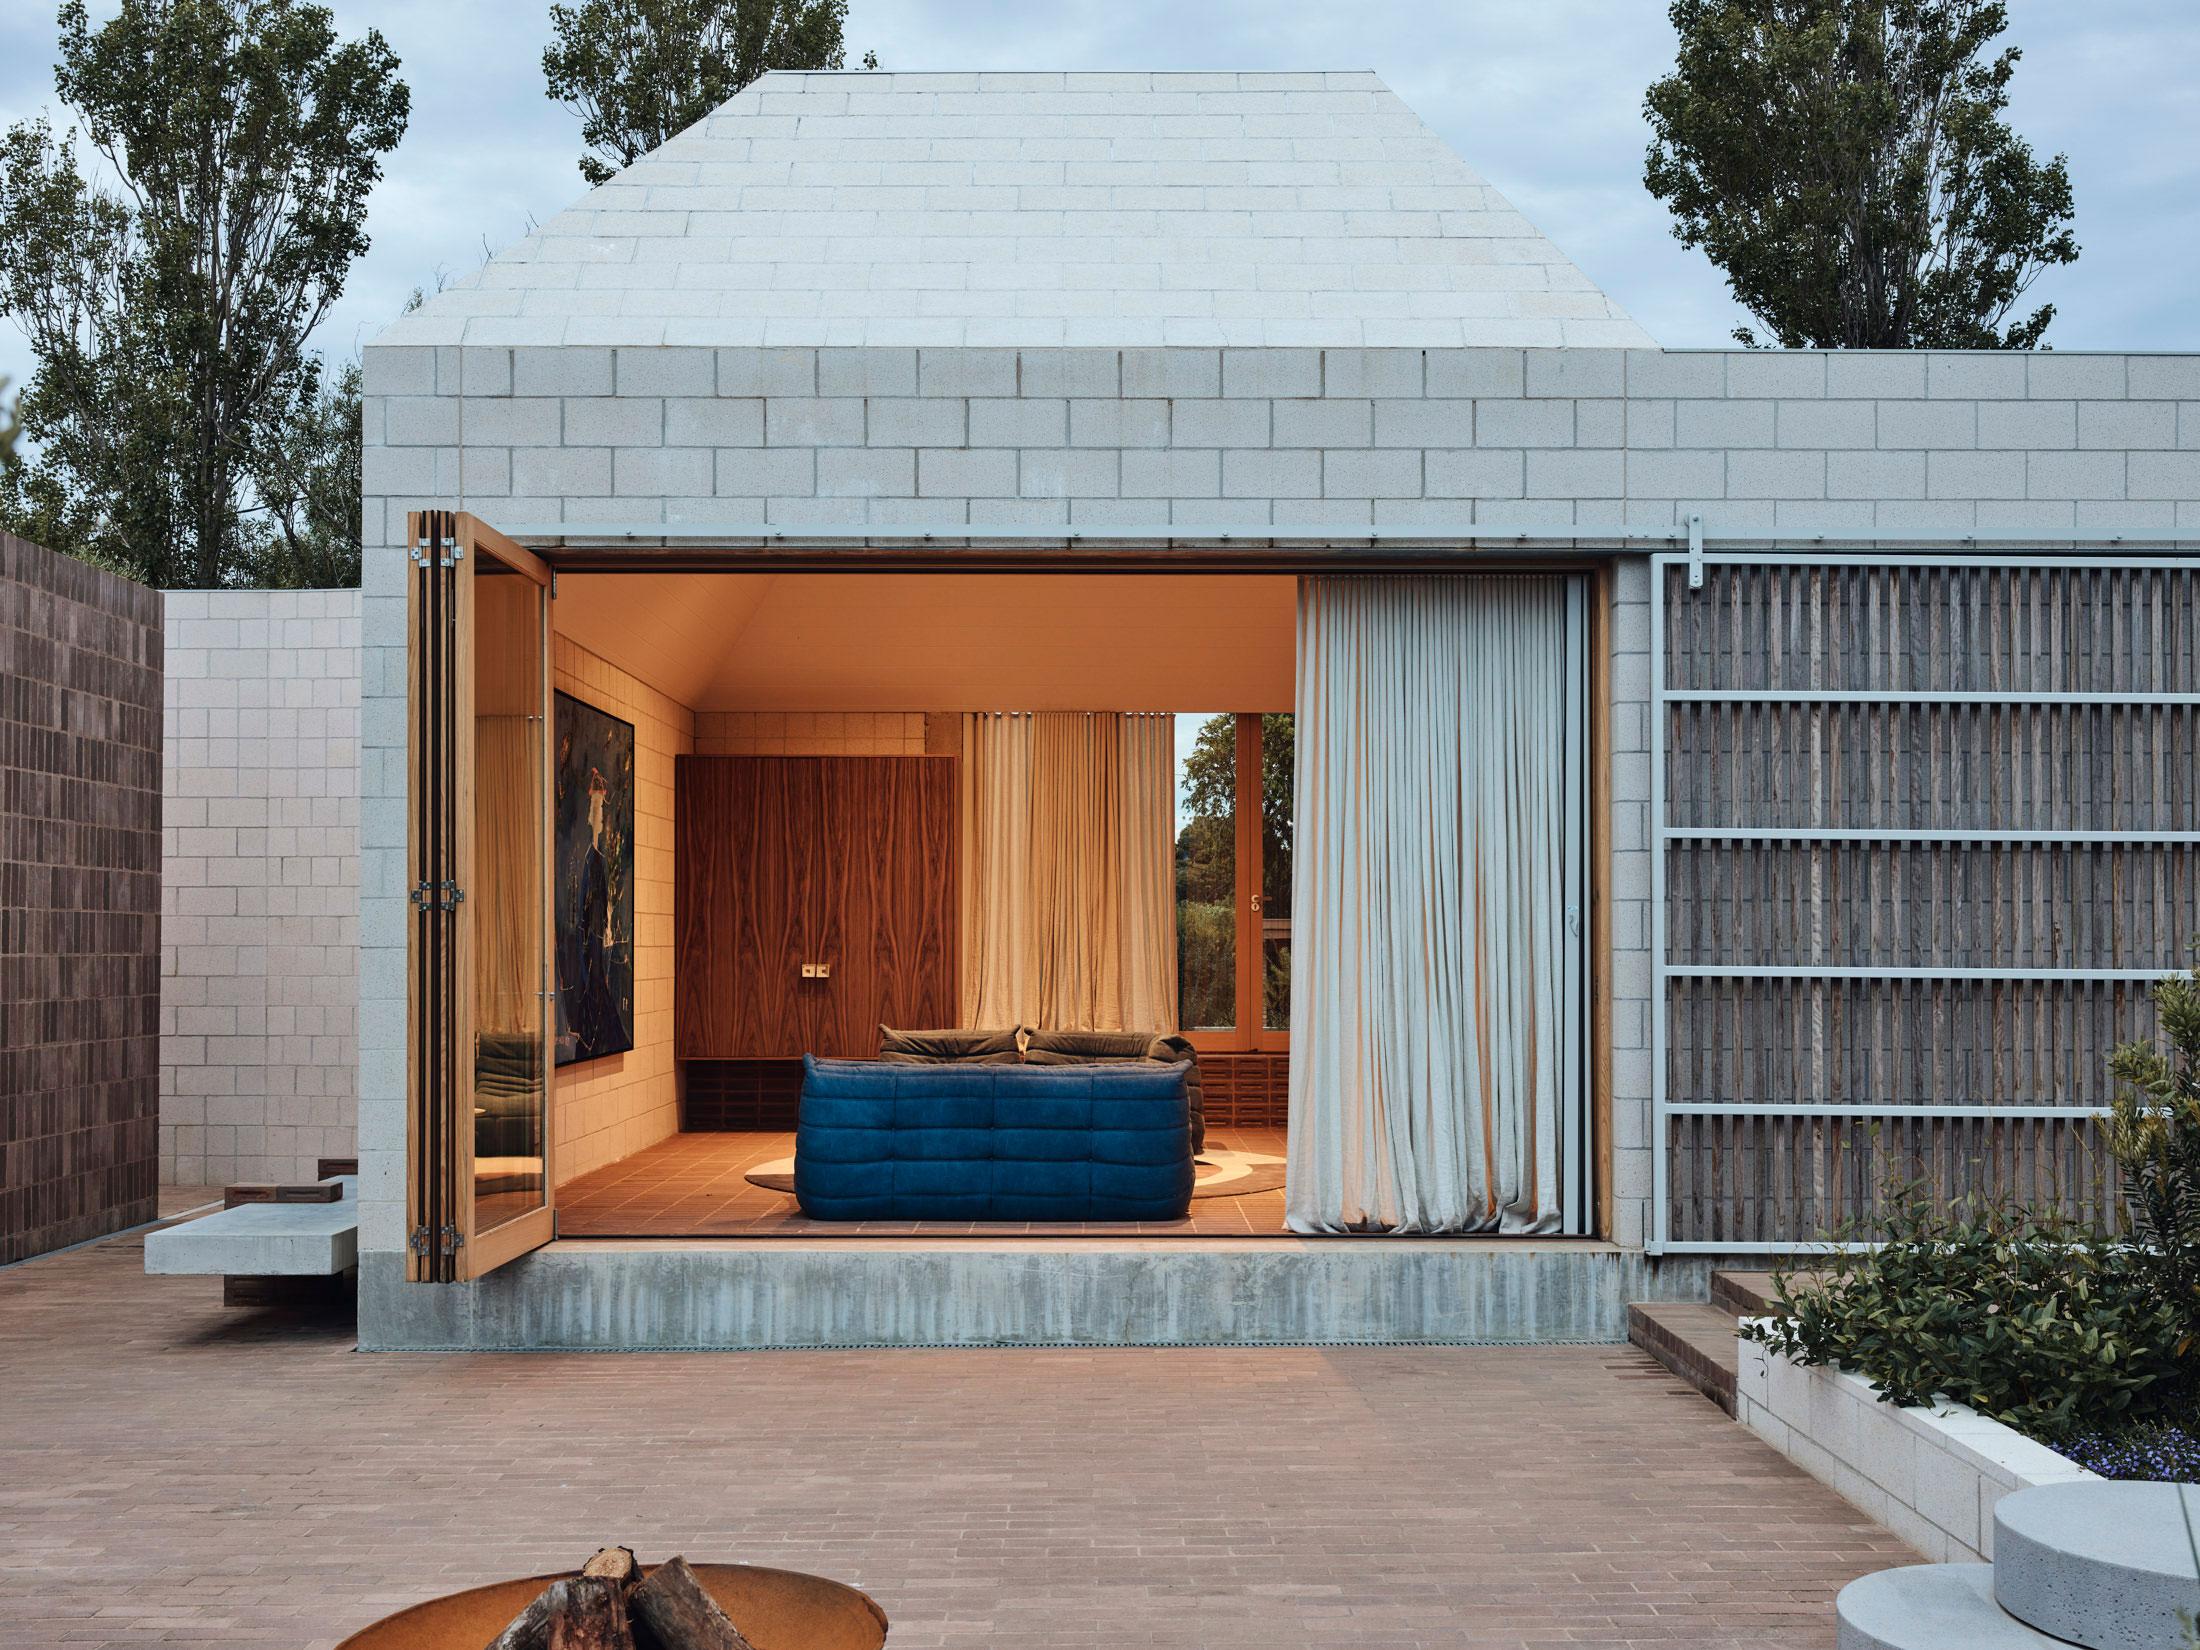 Architects Eat Bellows Beach House Flinders Masonry Architecture Photo Derek Swalwell Yellowtrace 60